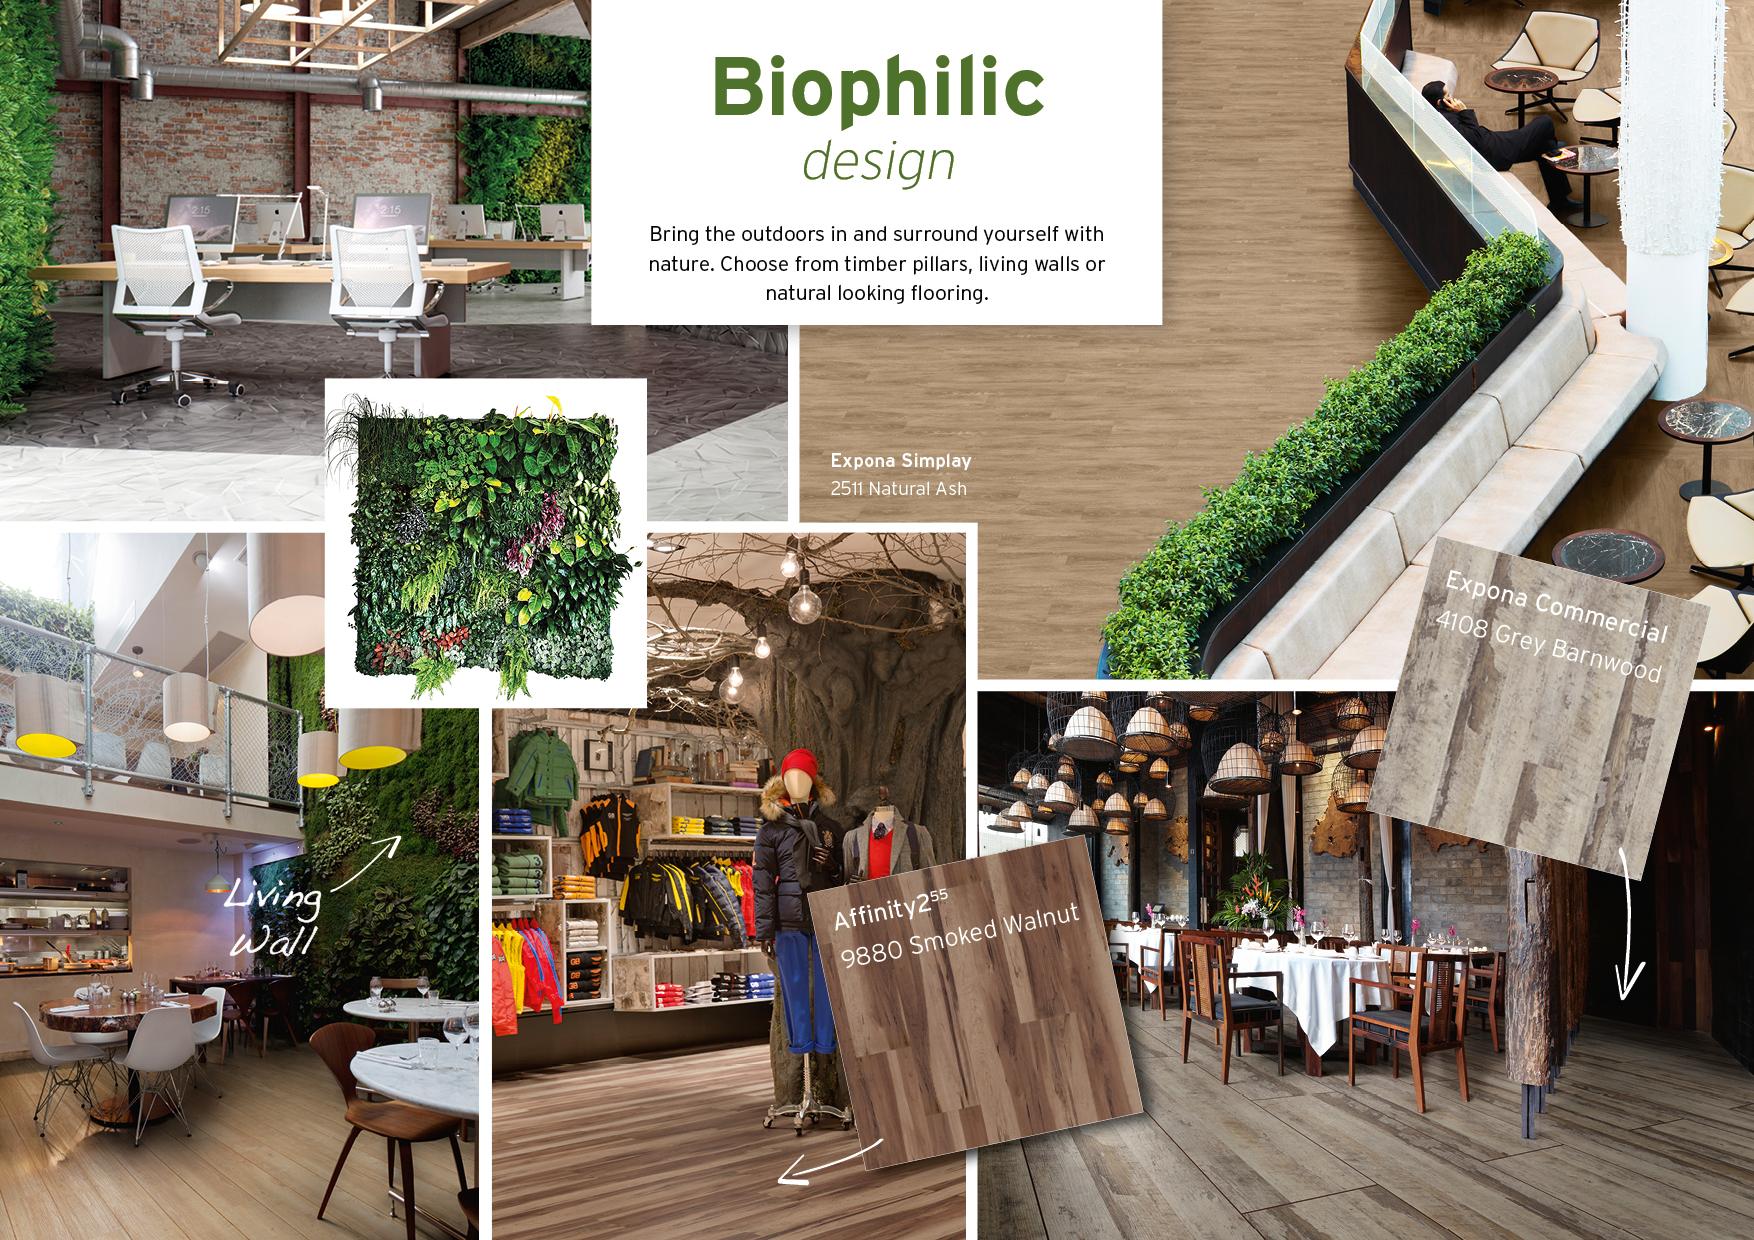 Image:LVT Trend Spotlight : Biophilic Design